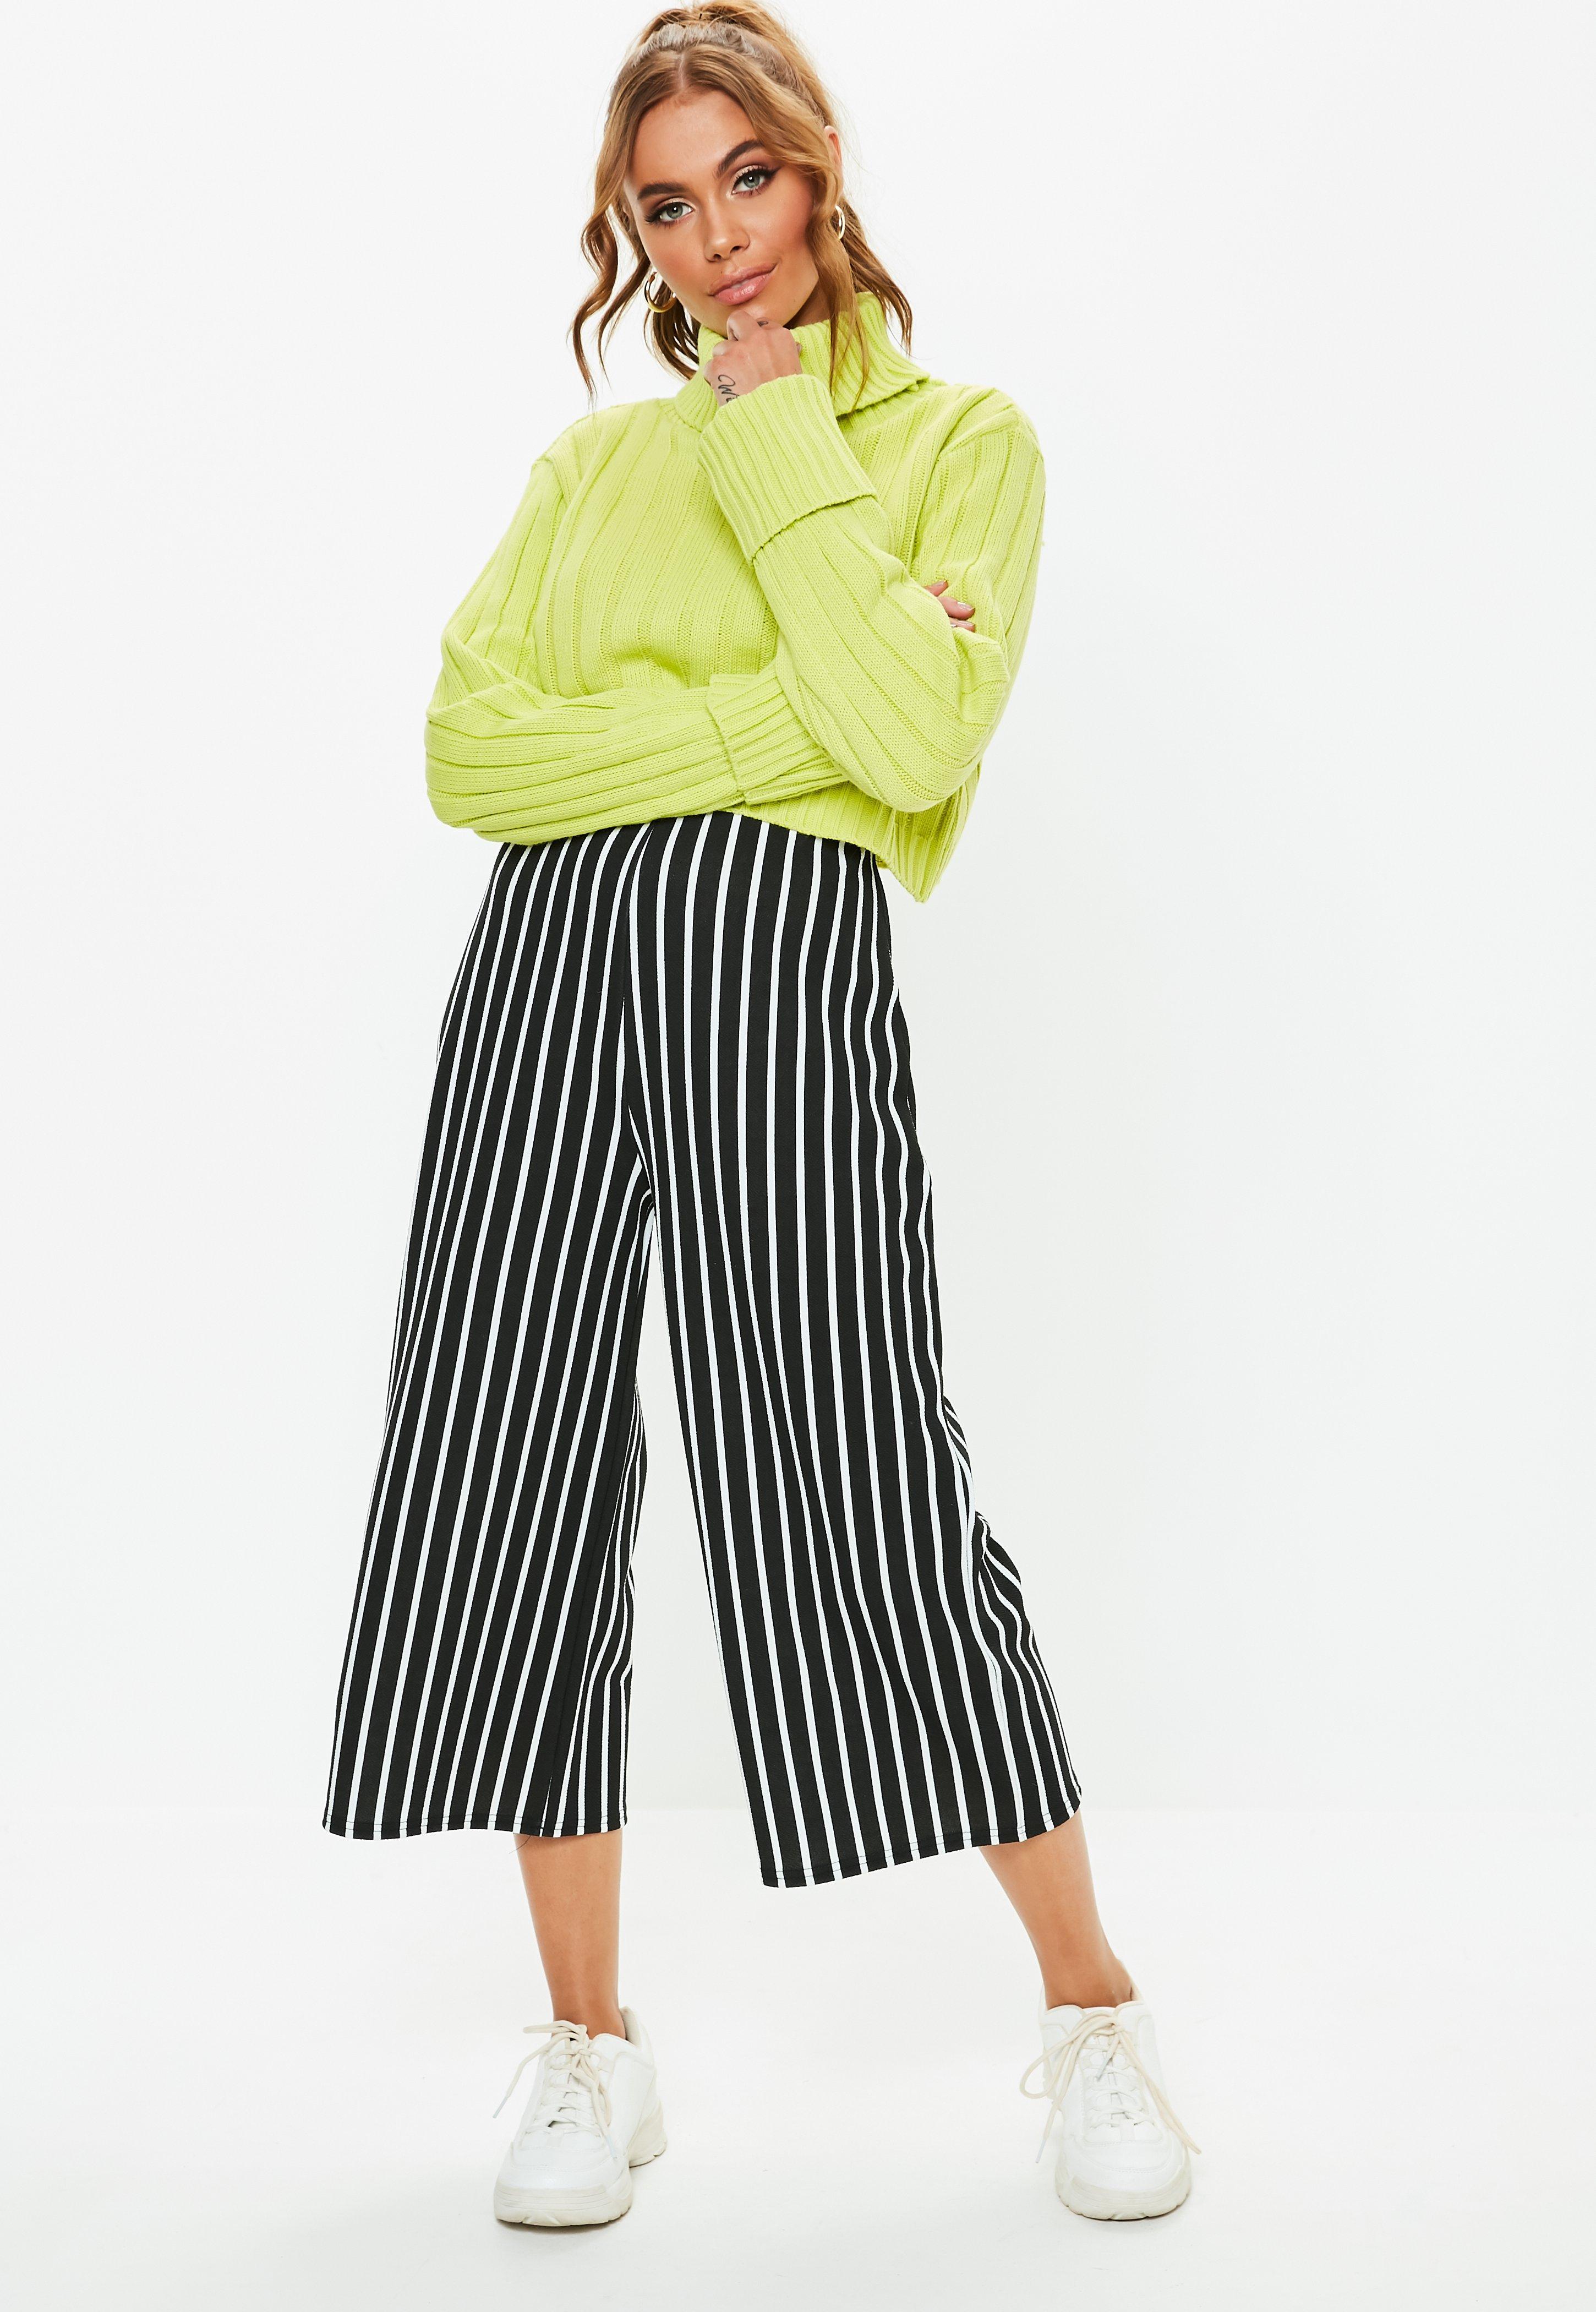 186642e7a1ae Culottes - Cropped Pants   Floral Culottes